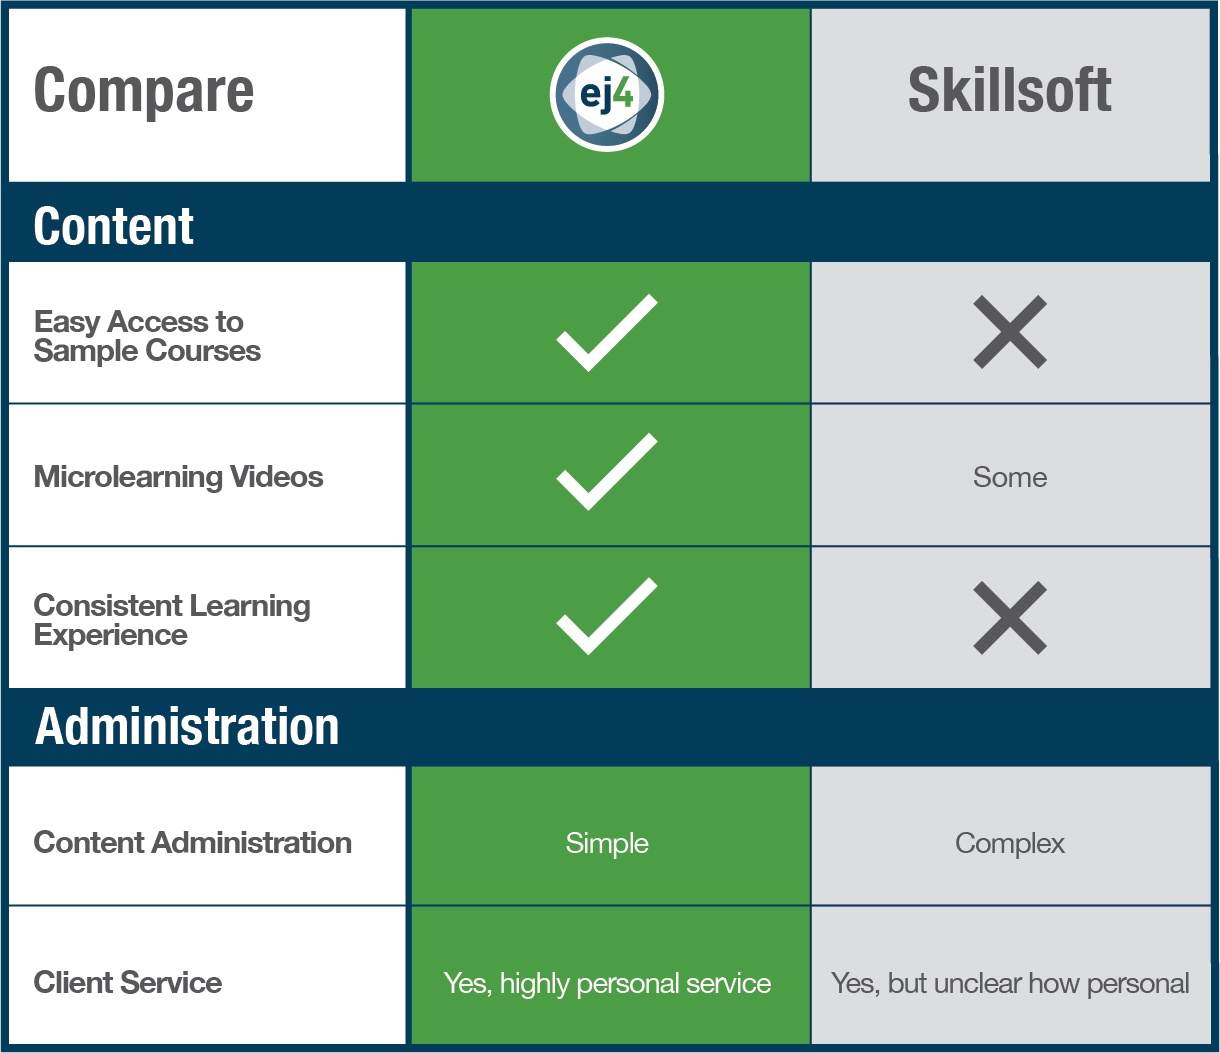 Compare Skillsoft with ej4